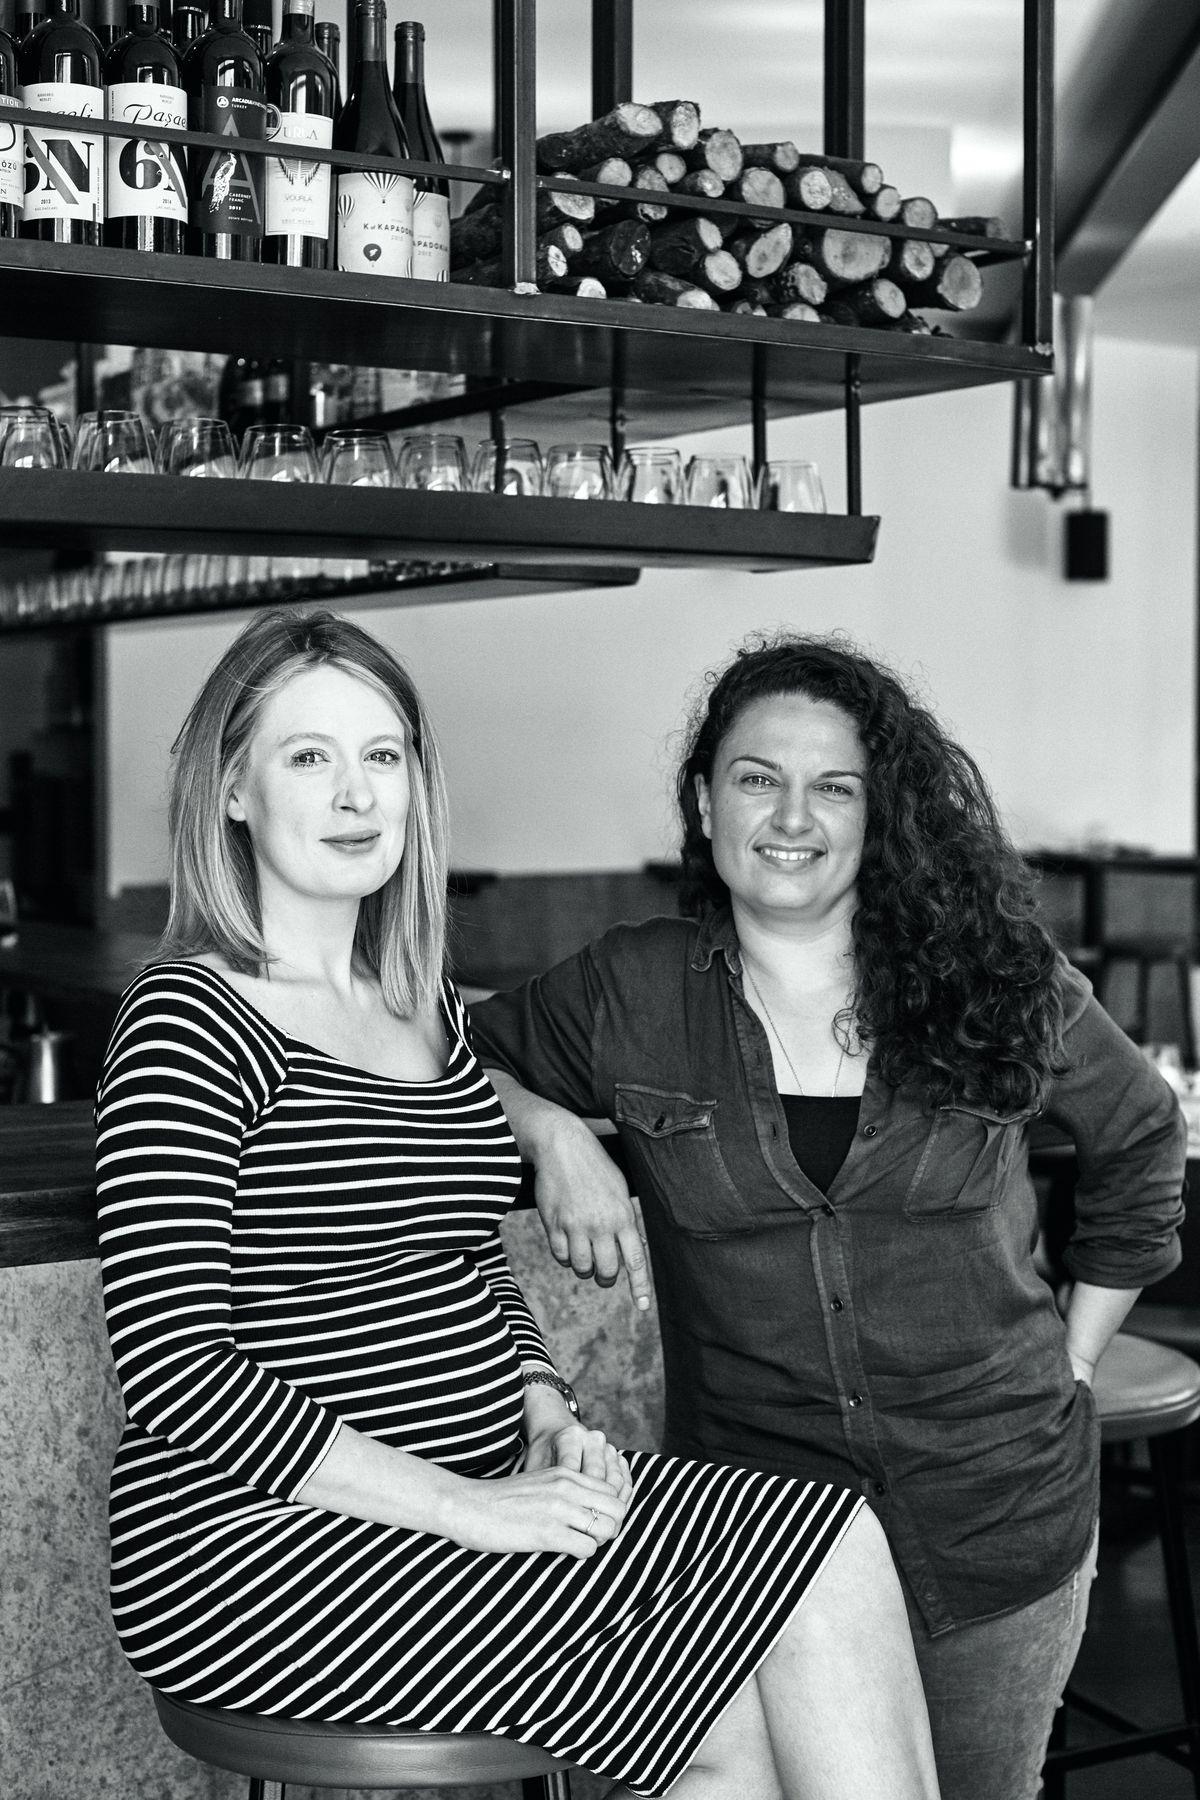 Oklava's Laura Christie and Selin Kiazim sit side by side in their modern Turkish restaurant